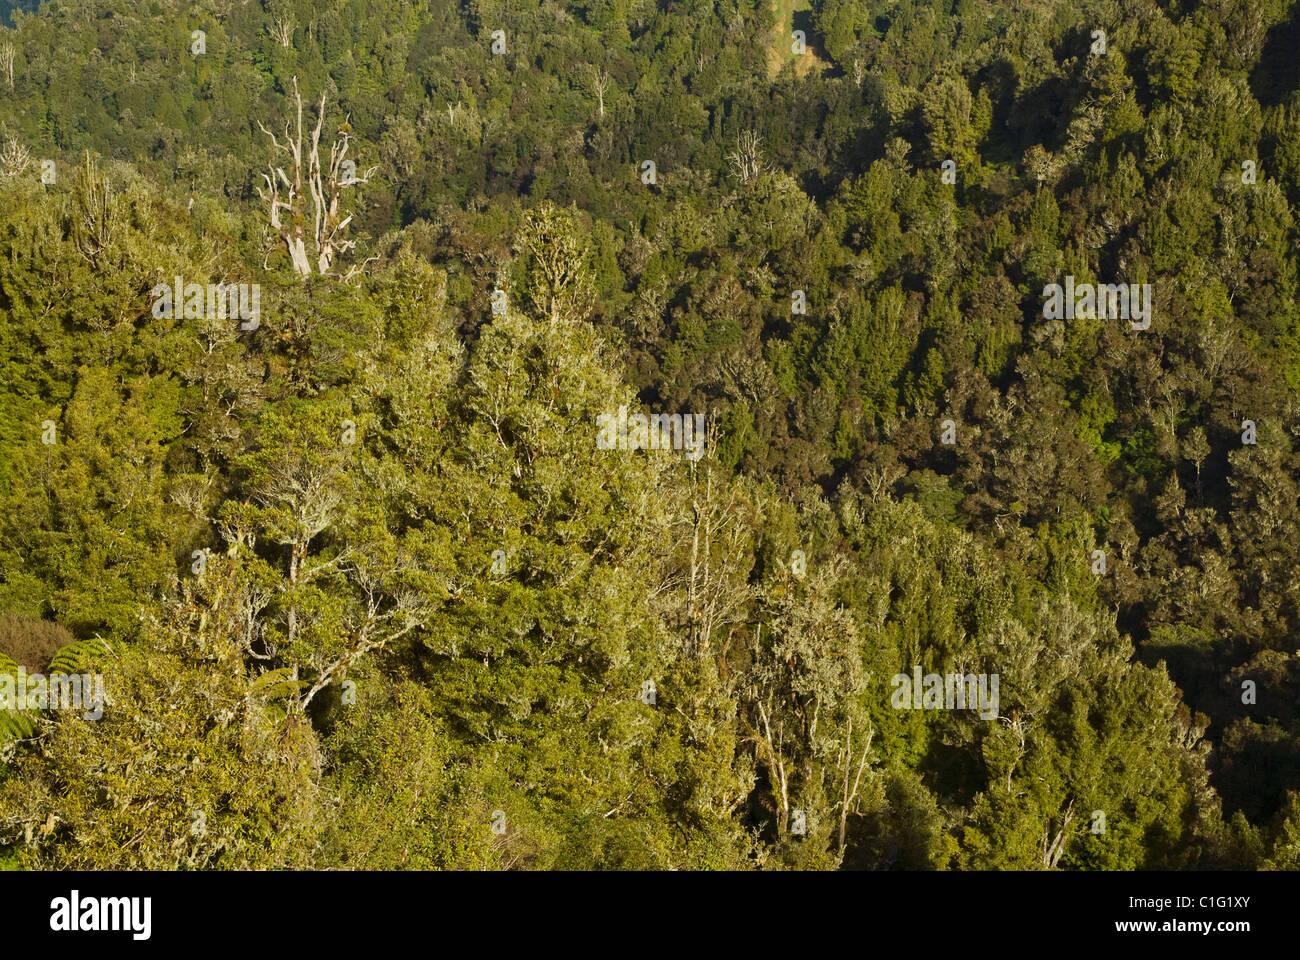 Brown kiwi (Apteryx mantelli) North Island, New Zealand - Stock Image